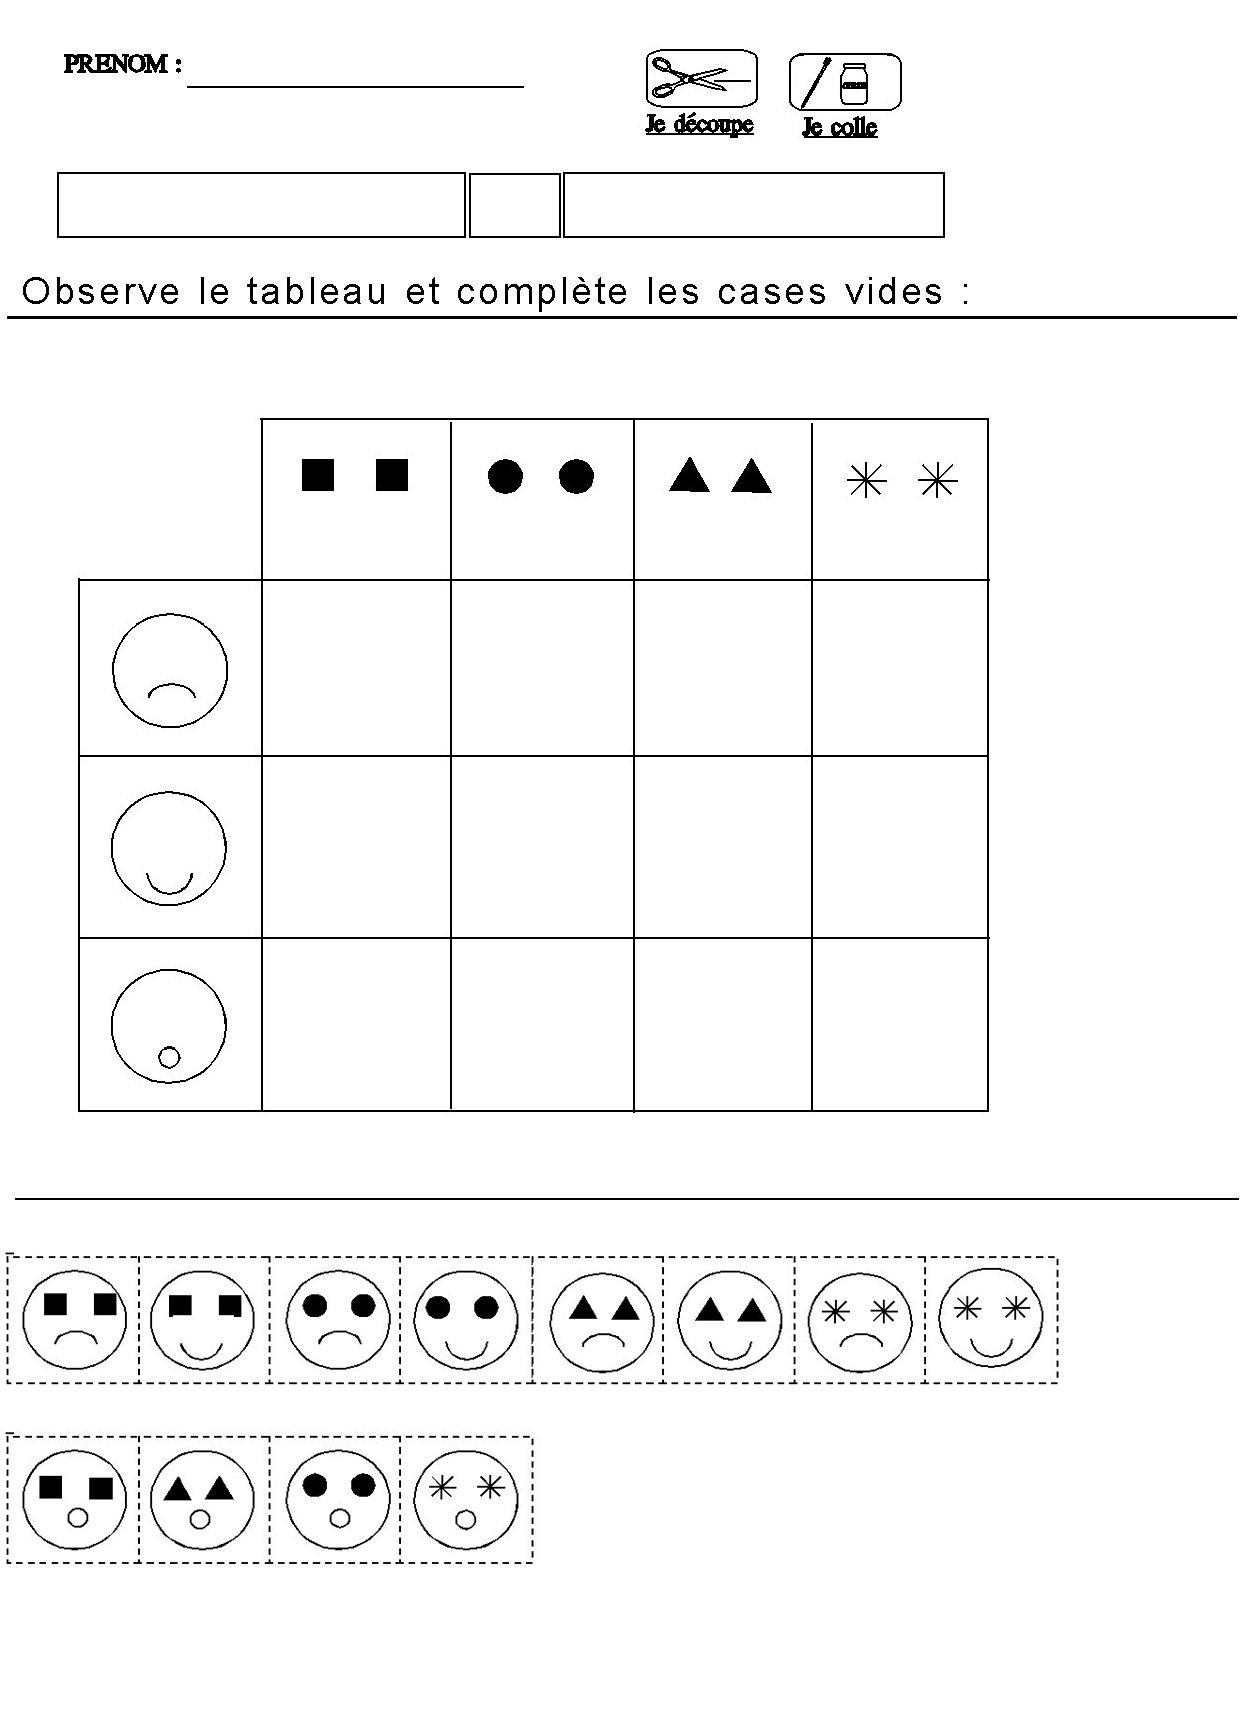 Tableau Double Entrees Pour Maternelle Moyenne Section avec Exercice Maternelle Moyenne Section